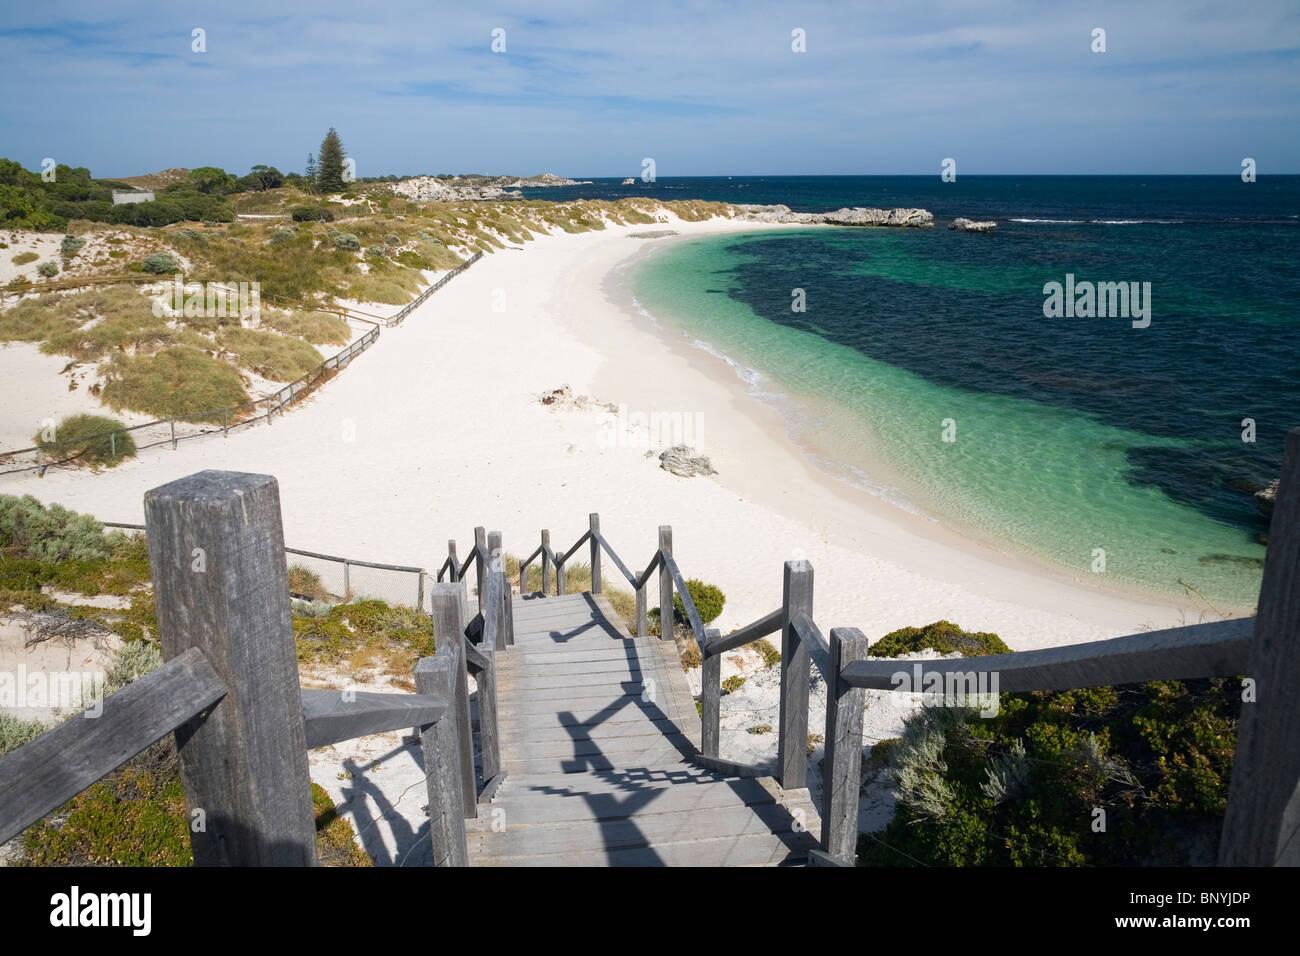 Pinky Beach on Rottnest Island, Western Australia, AUSTRALIA. - Stock Image